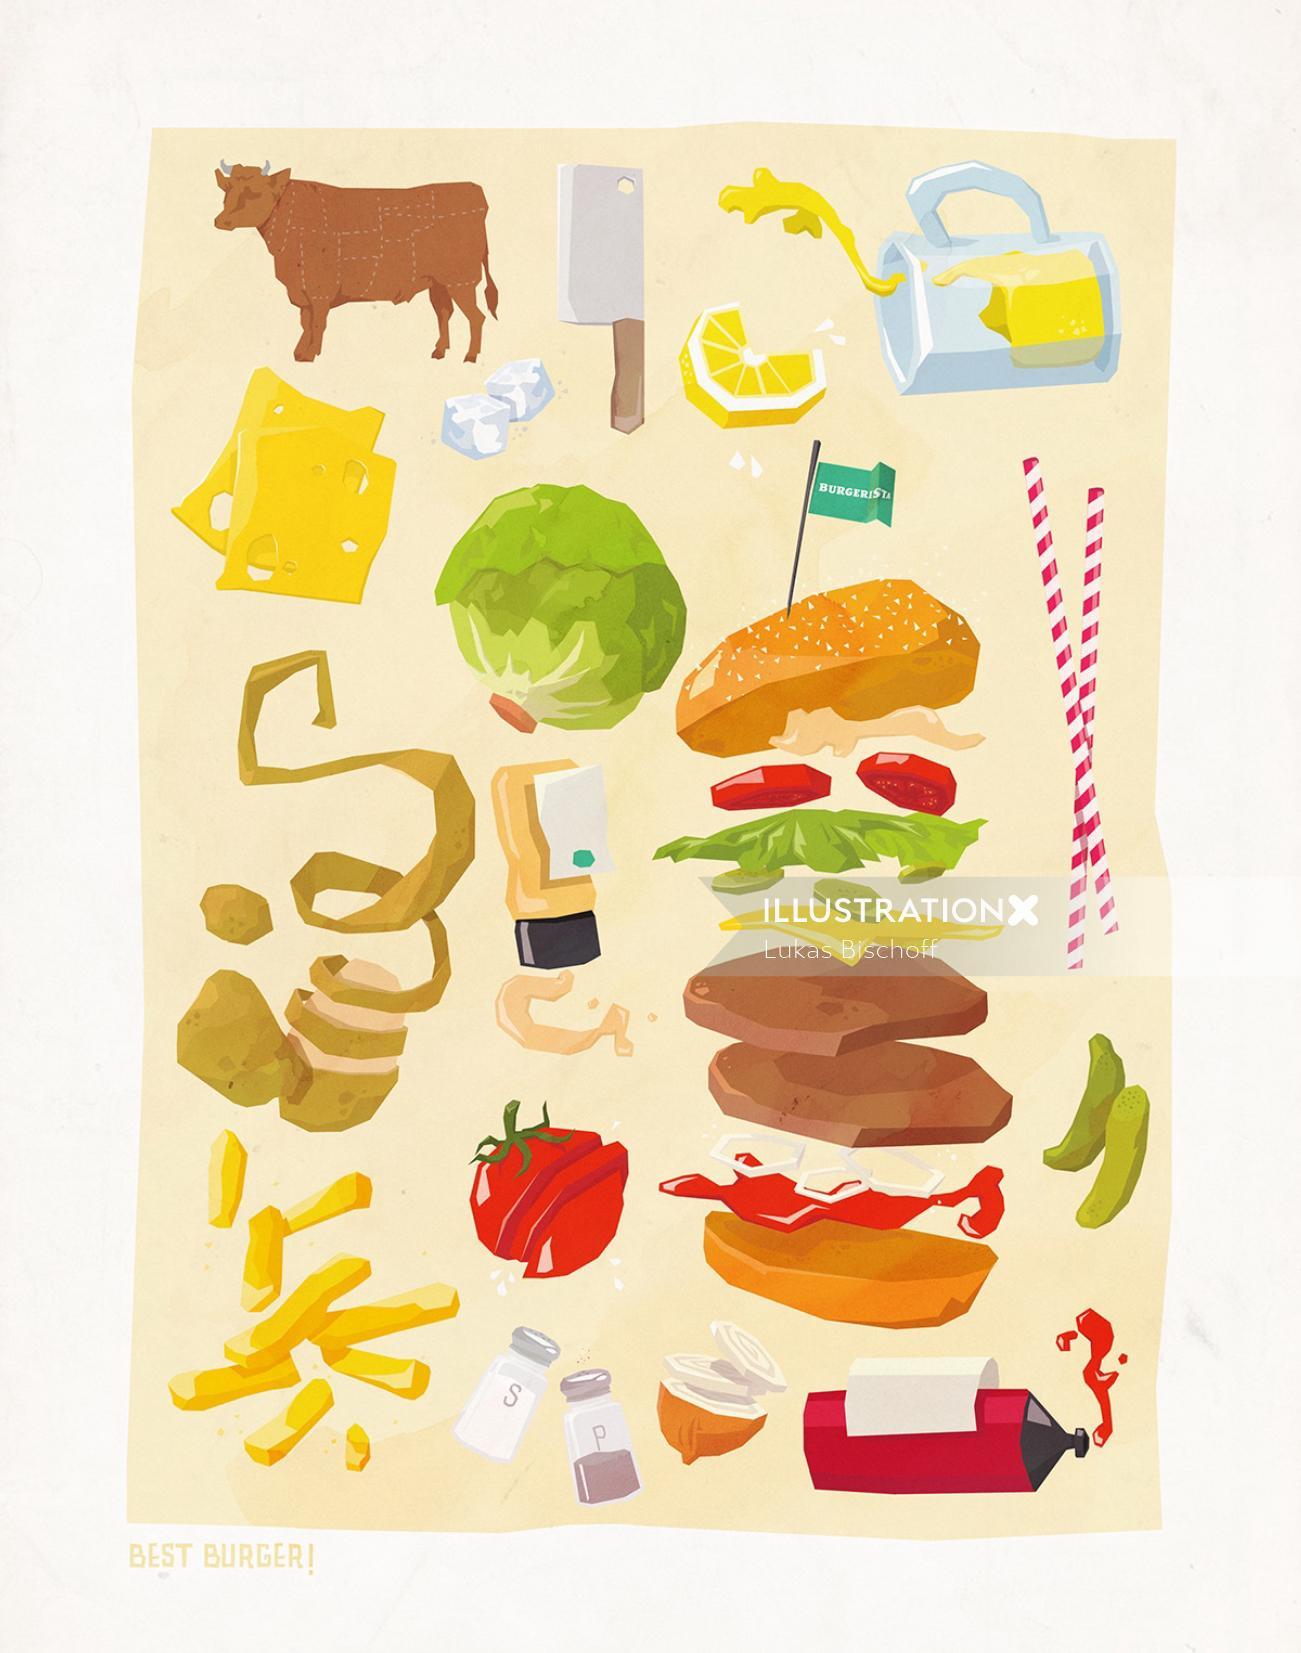 Food and drink illustration of fast food